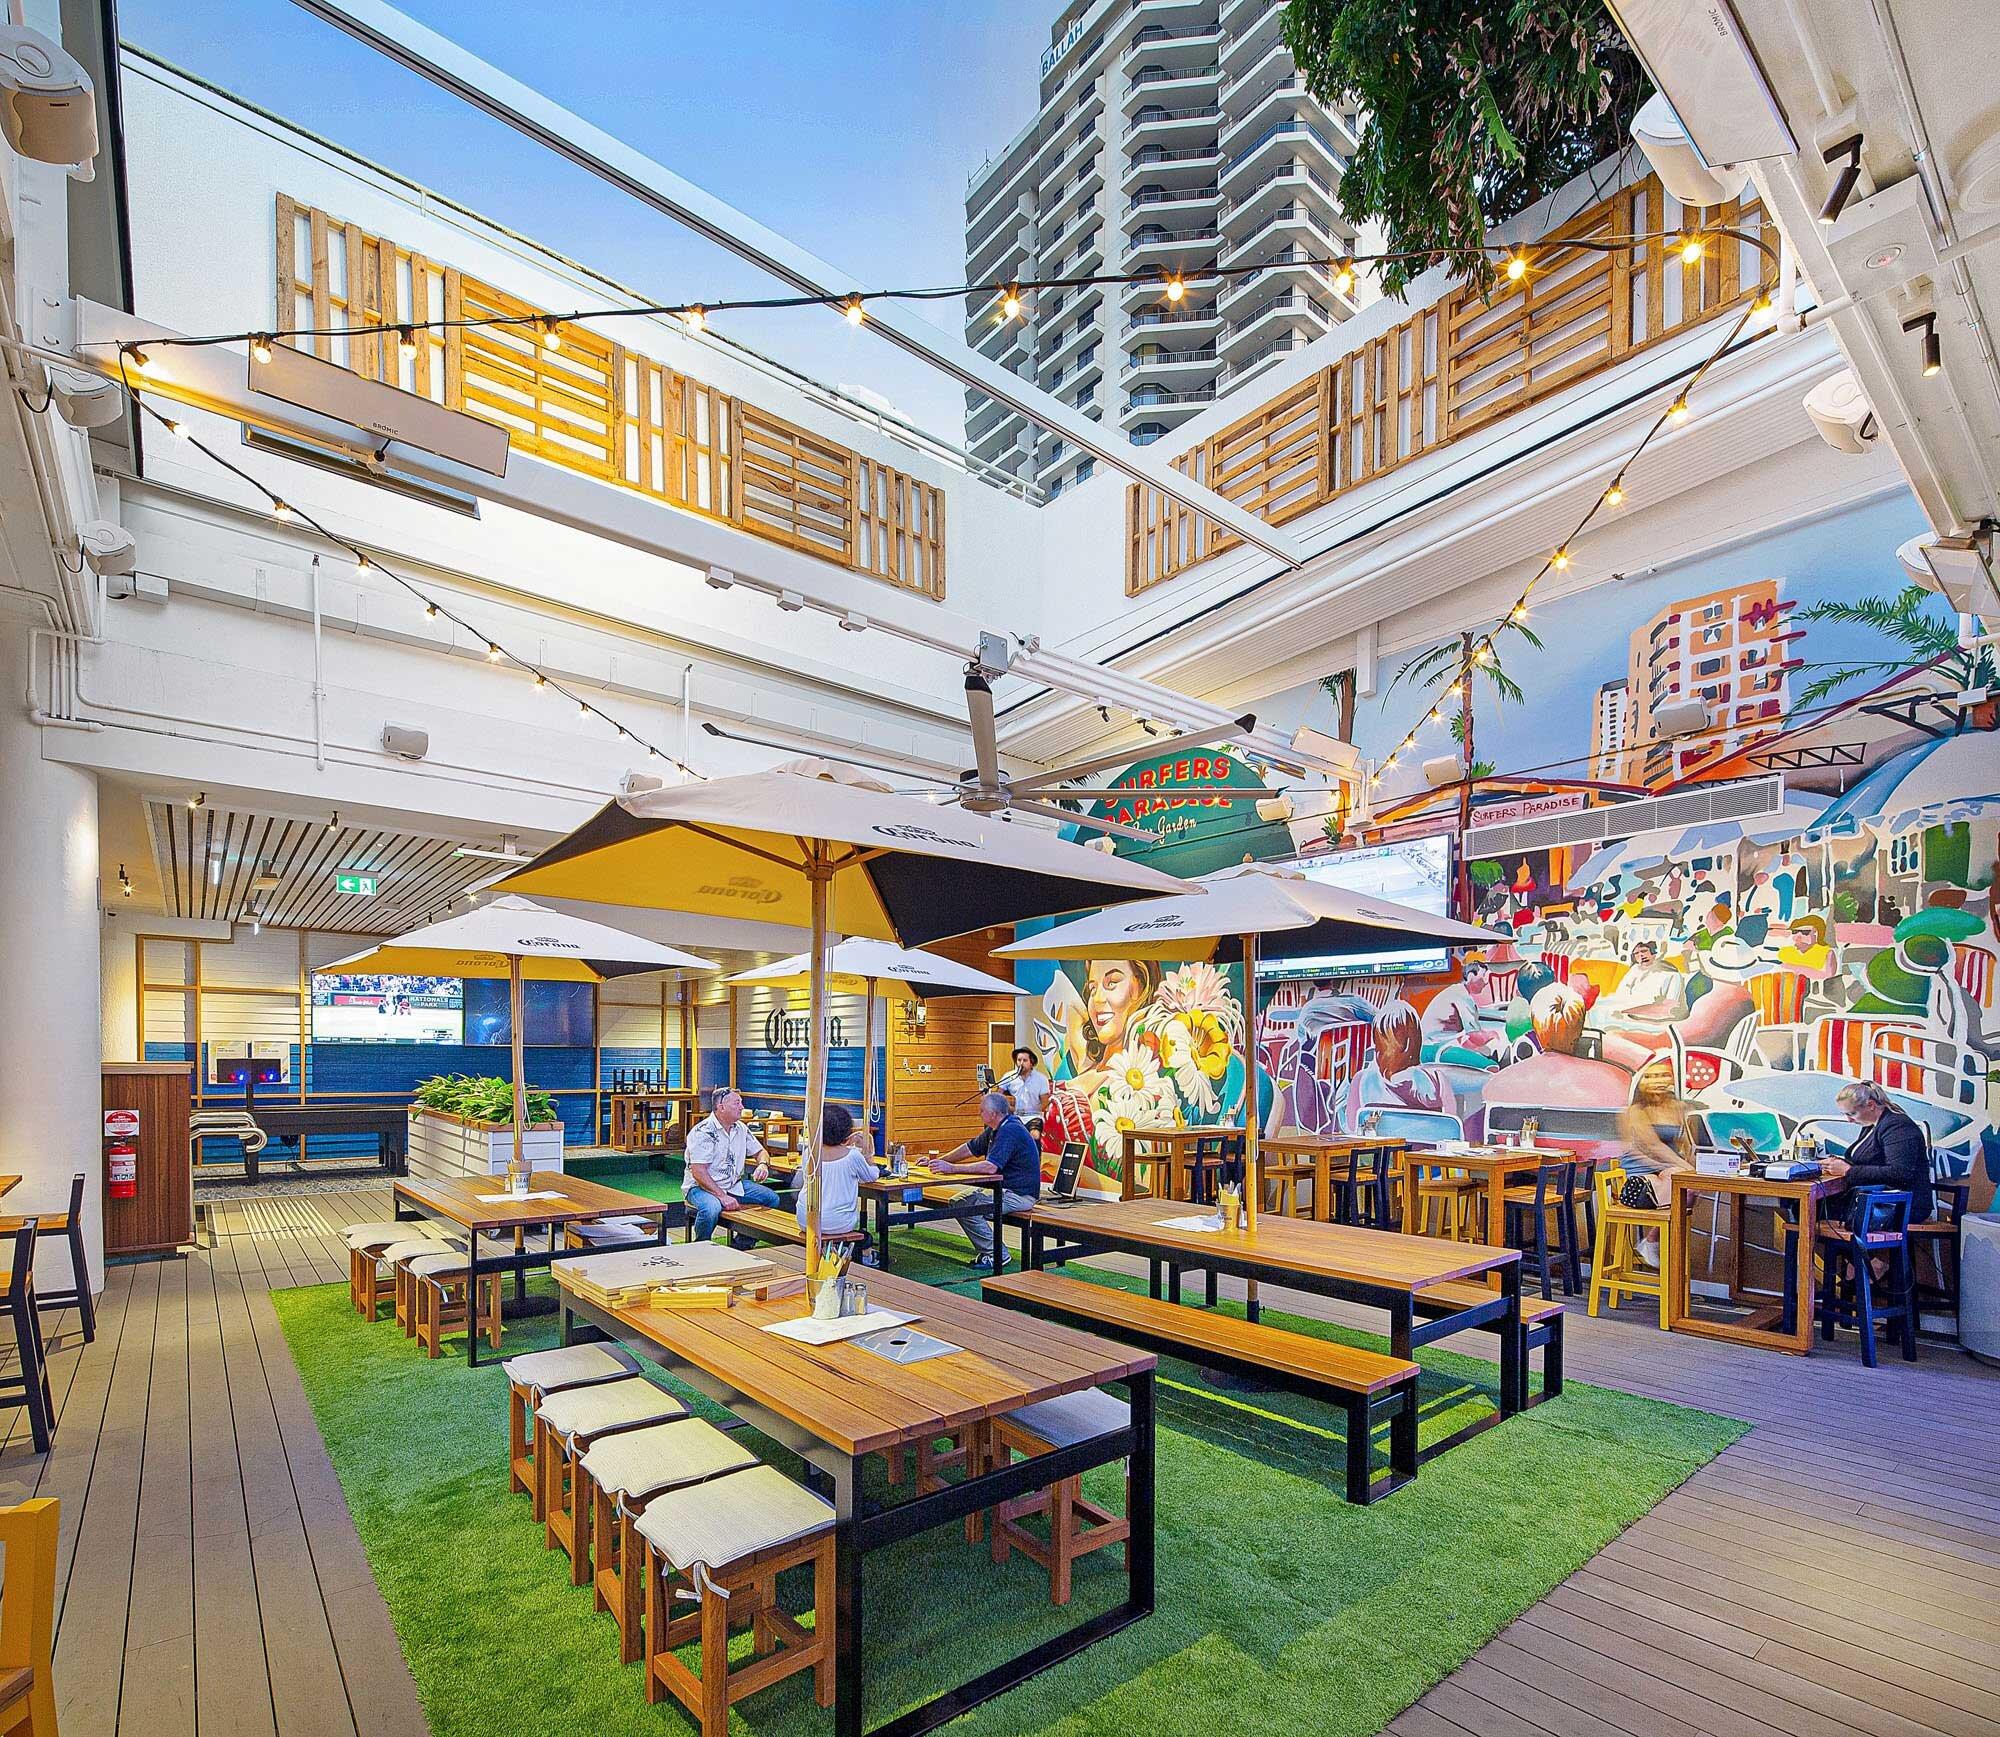 Surfers-Paradise-Beer-Garden-Pub-Architecture-1.jpg